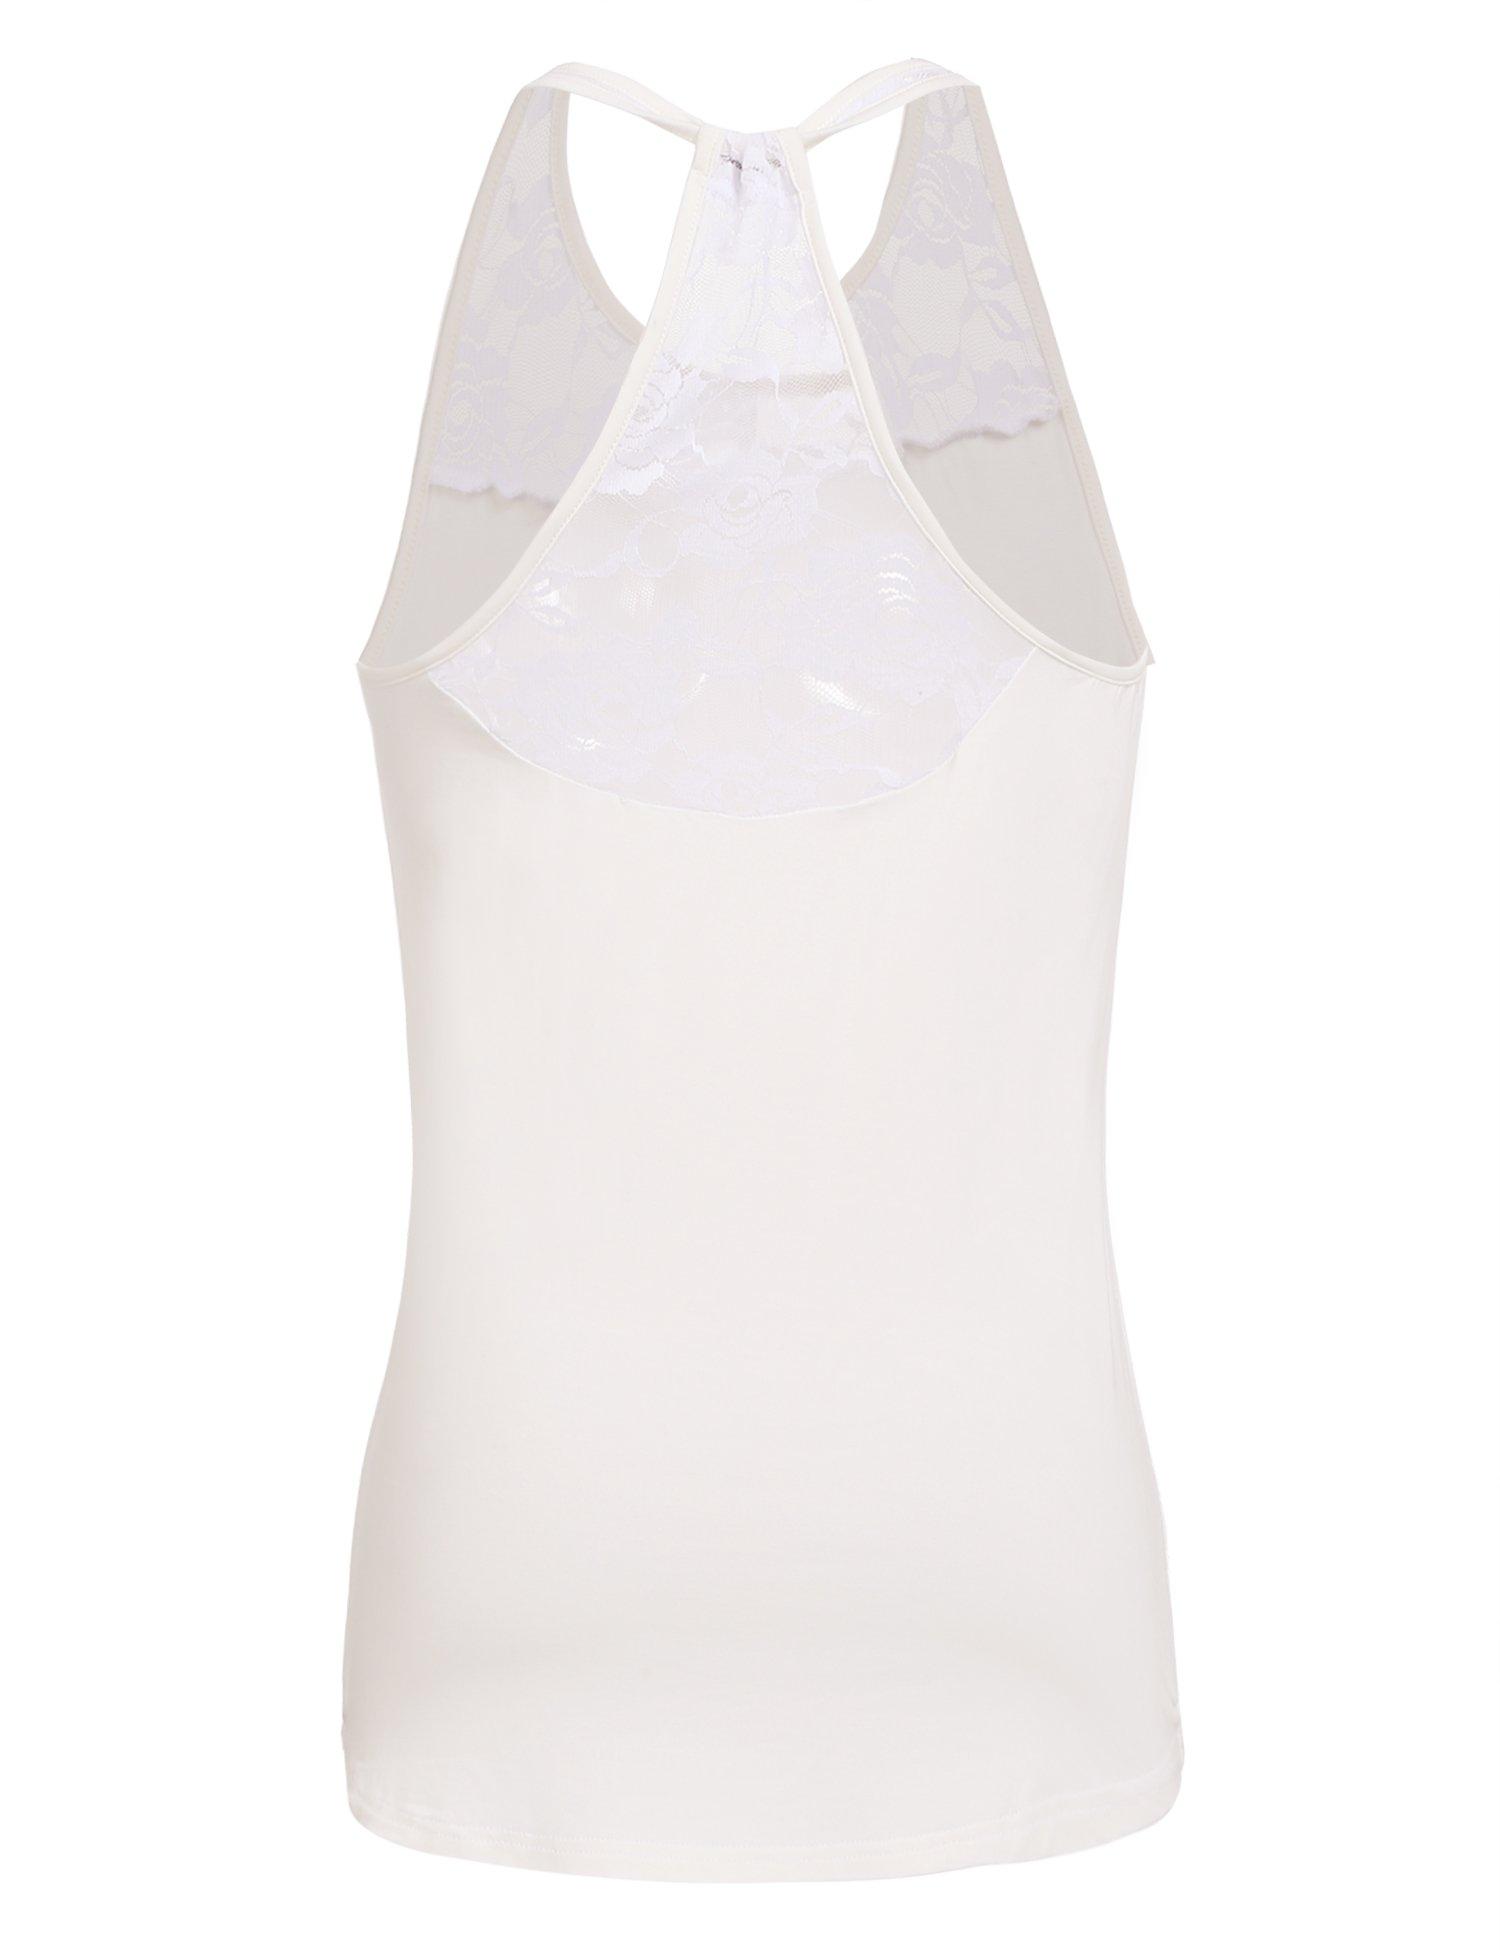 Mofavor Women's Sleeveless Crochet Lace Camisole Vest Halter Racerback Tank Top,White,Large by Mofavor (Image #4)